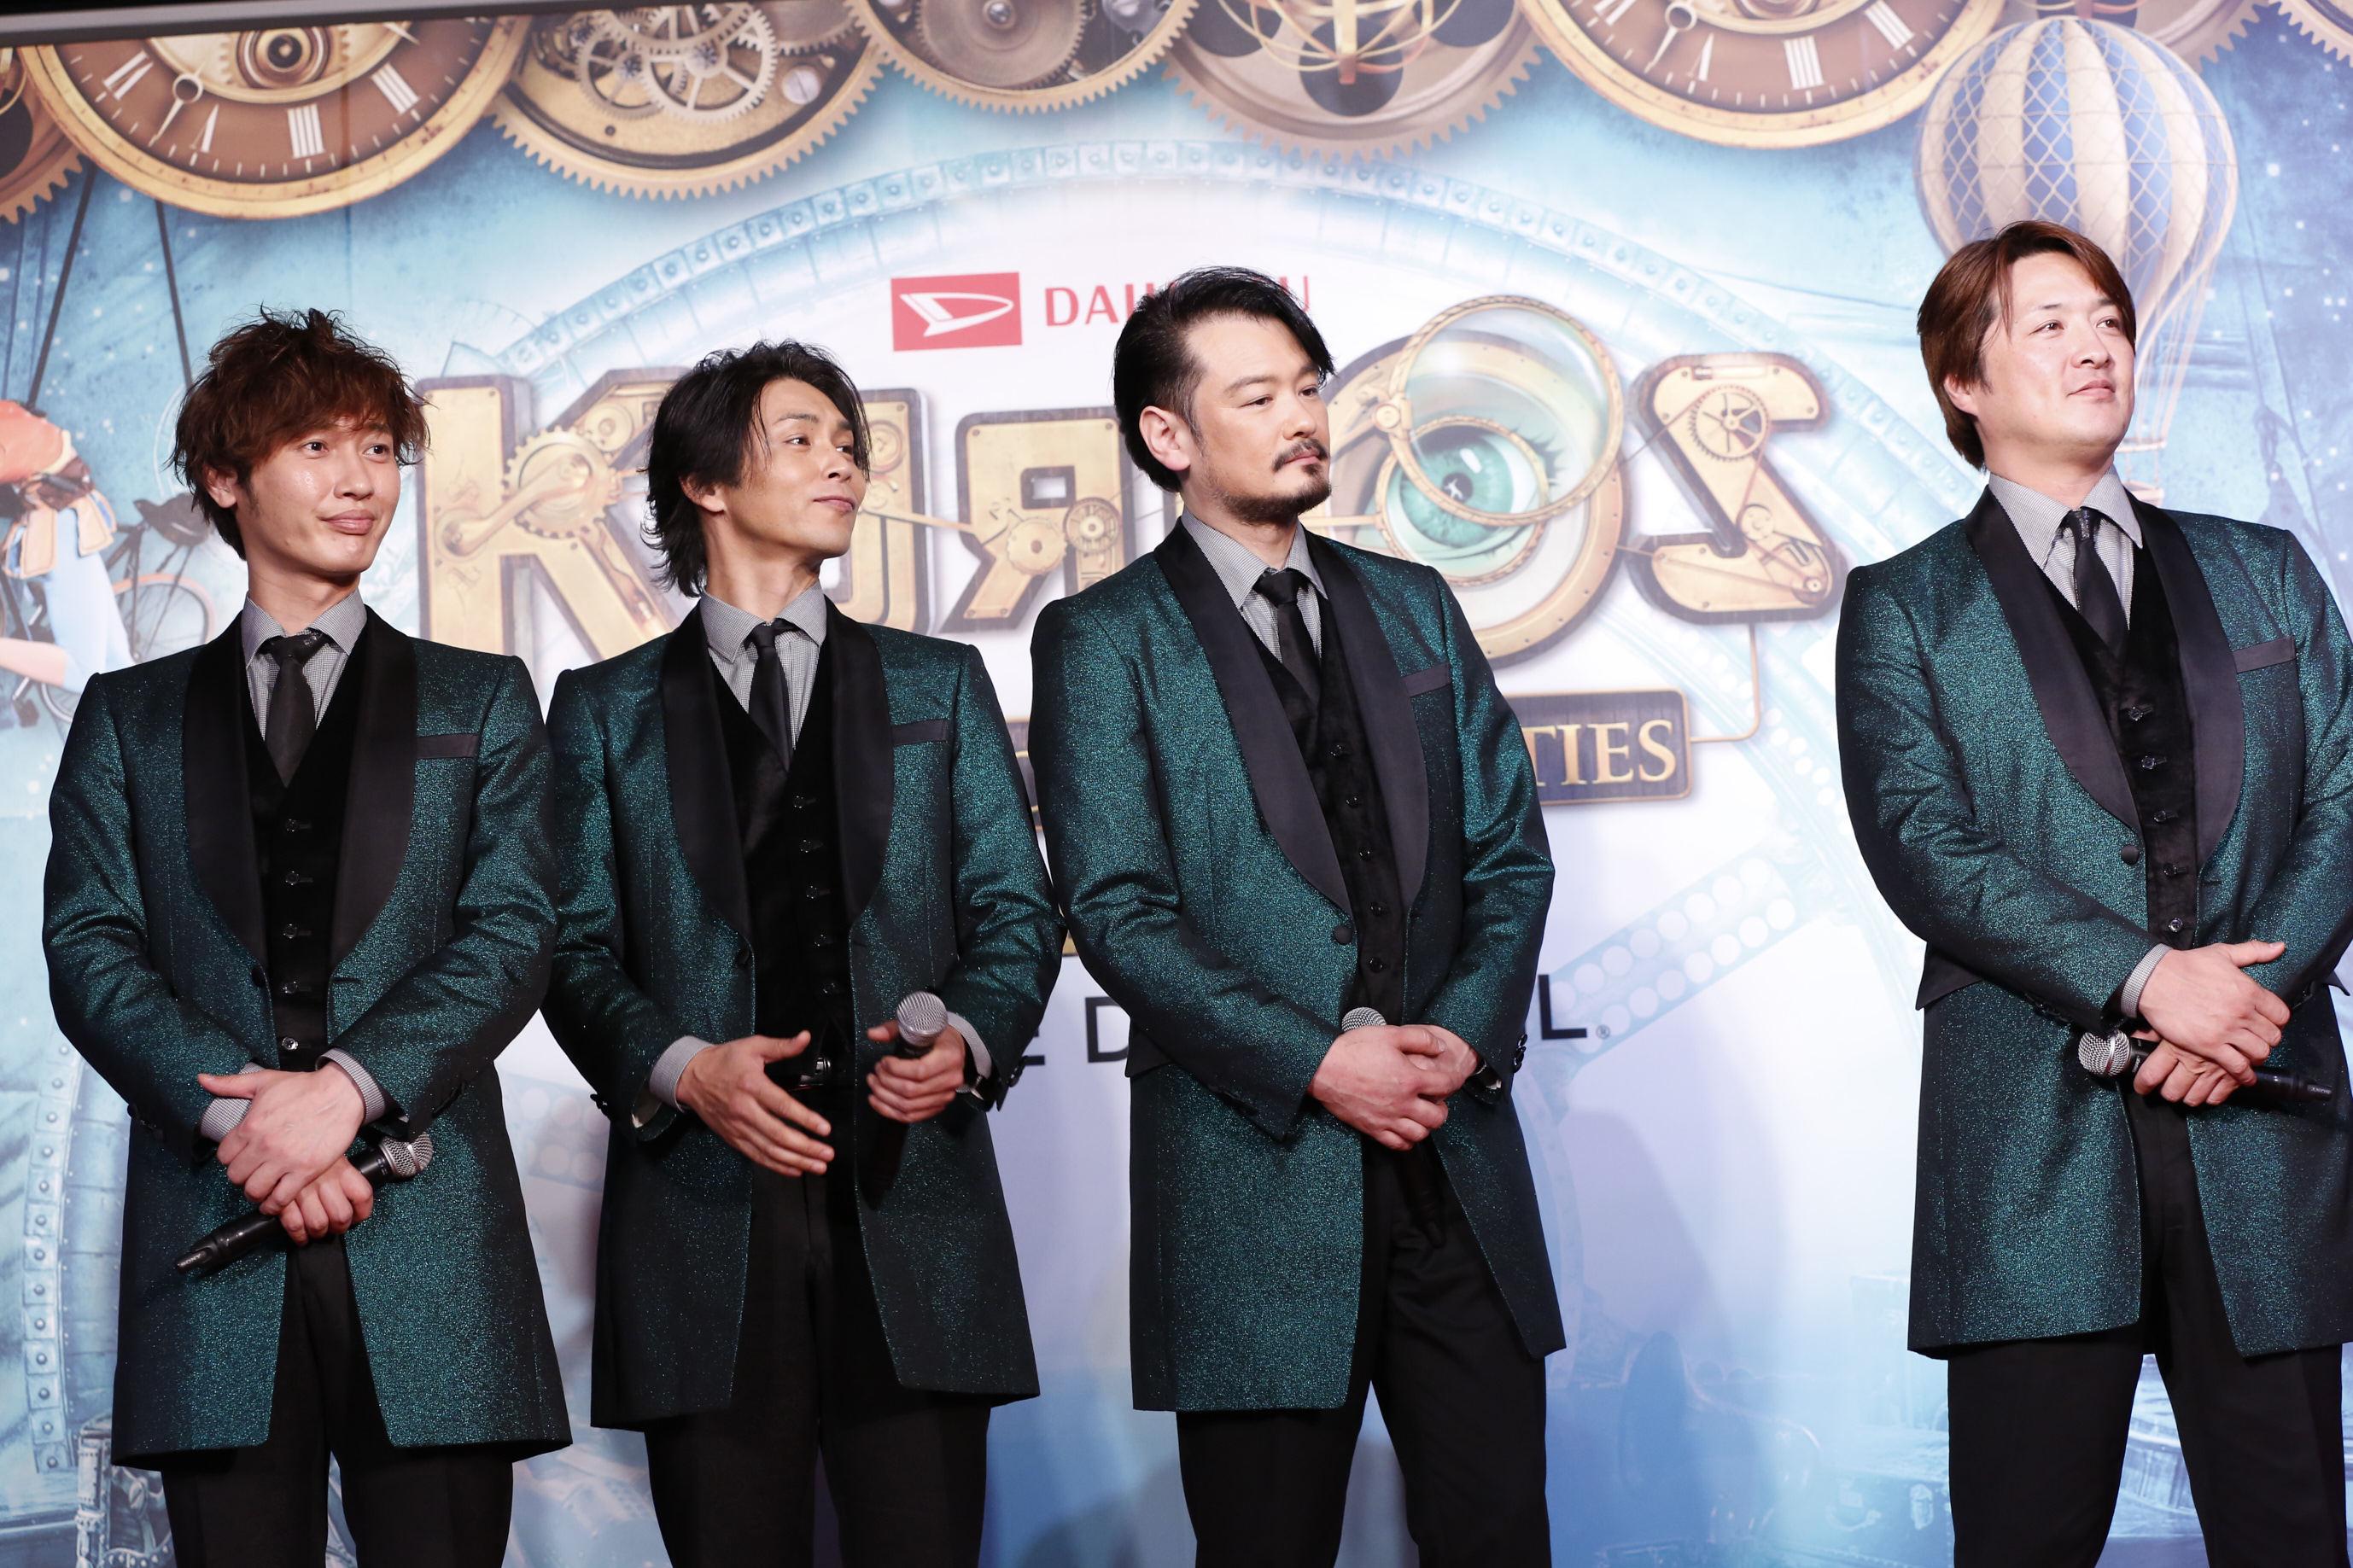 純烈(左から)後上翔太、白川裕二郎、小田井涼平、酒井一圭